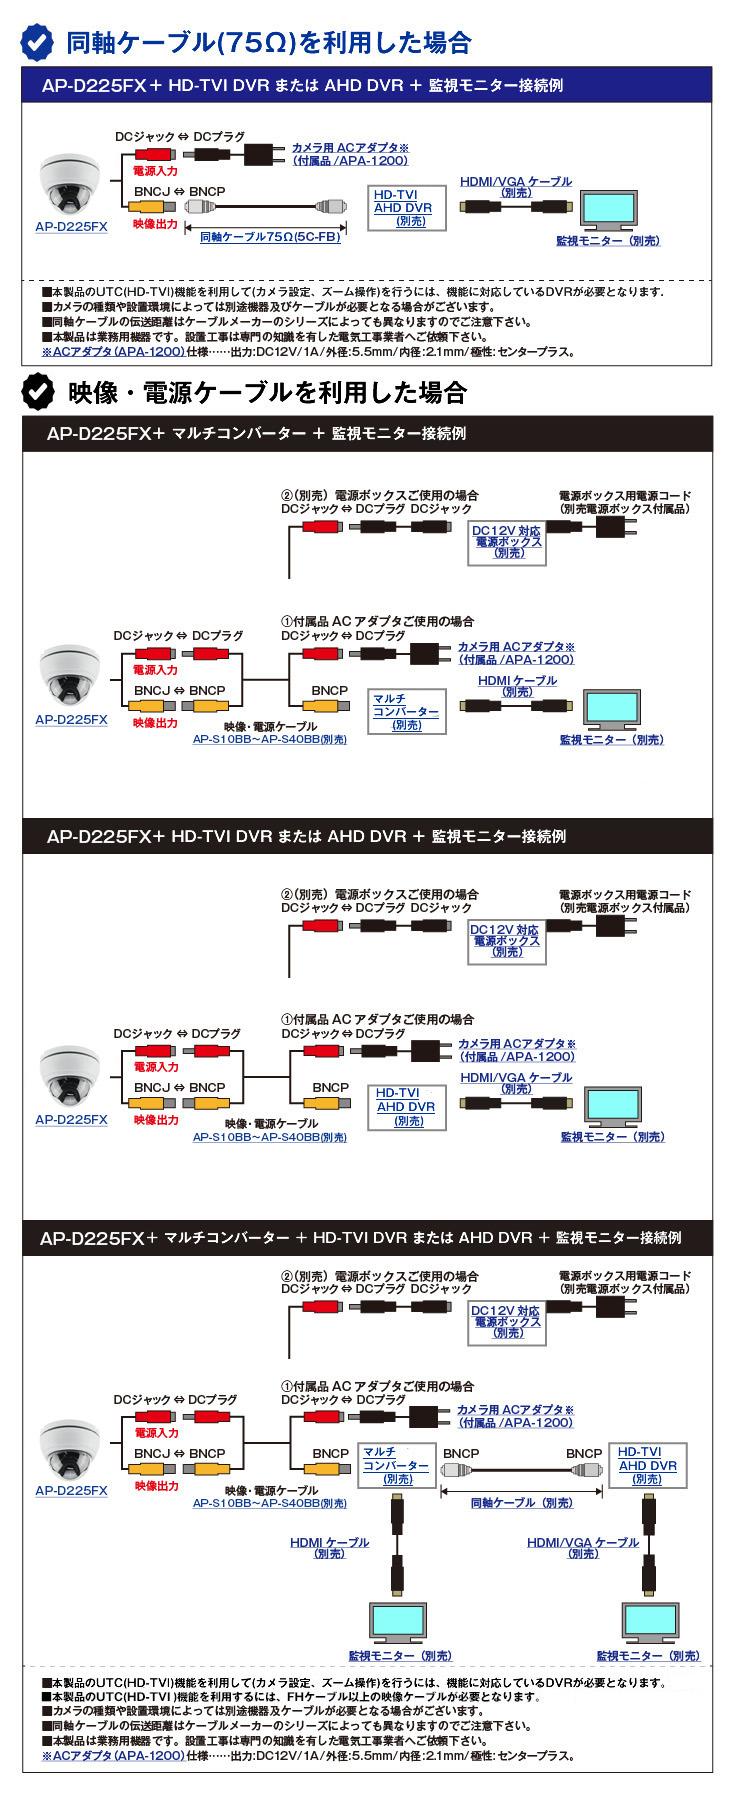 HD-TVI 514万画素防犯カメラ(AP-D225FX)